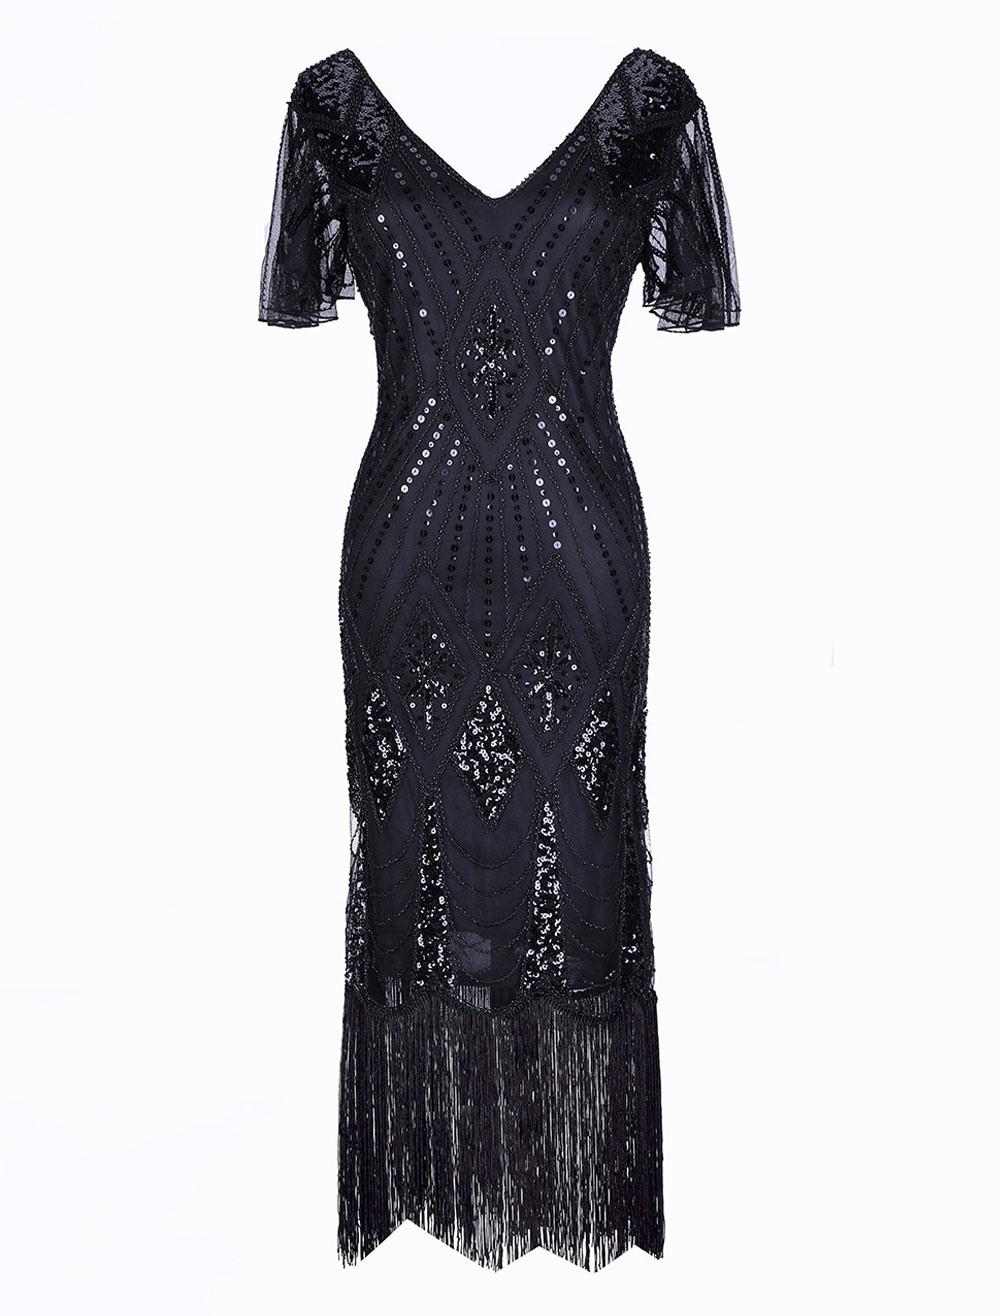 7f54006029b ... 1920s Flapper Dress Great Gatsby Vintage Costume Halloween Women Sequin  Tassels V Neck Short Sleeve Dresses. 12. 40%OFF. Color Black